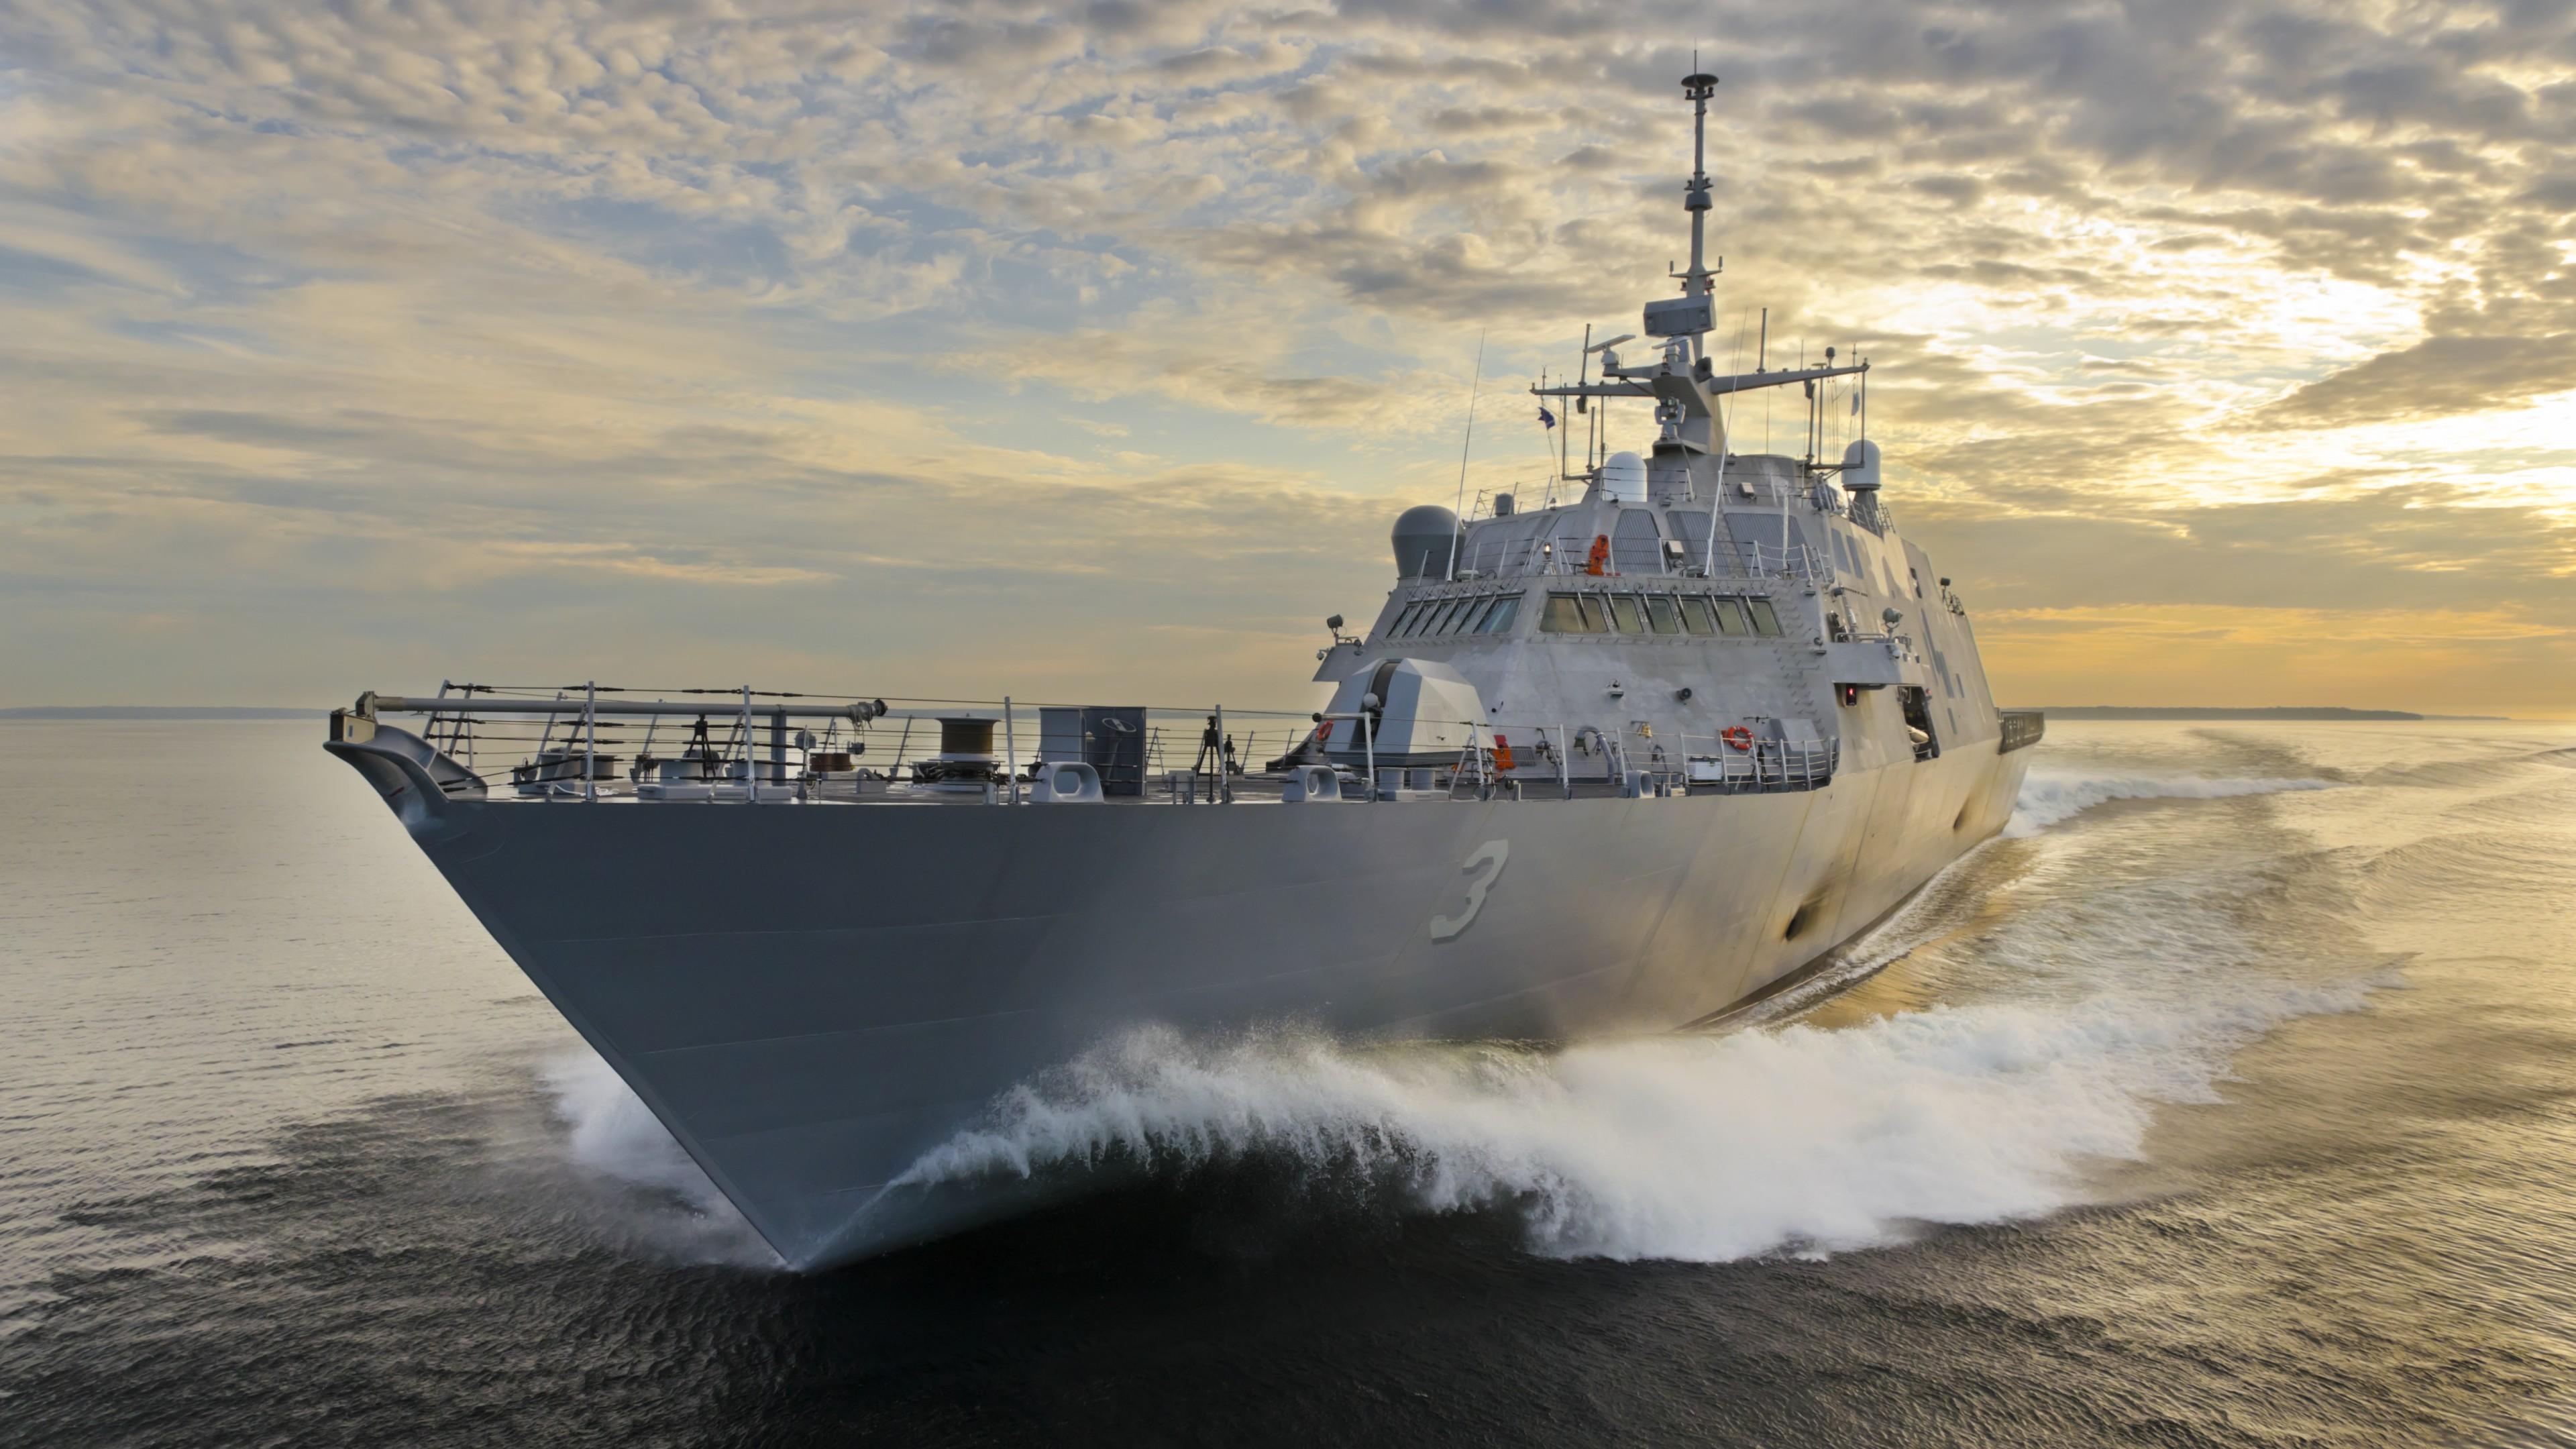 Aircraft Carrier Hd Wallpaper Wallpaper Uss Fort Worth Lcs 3 Littoral Freedom Class